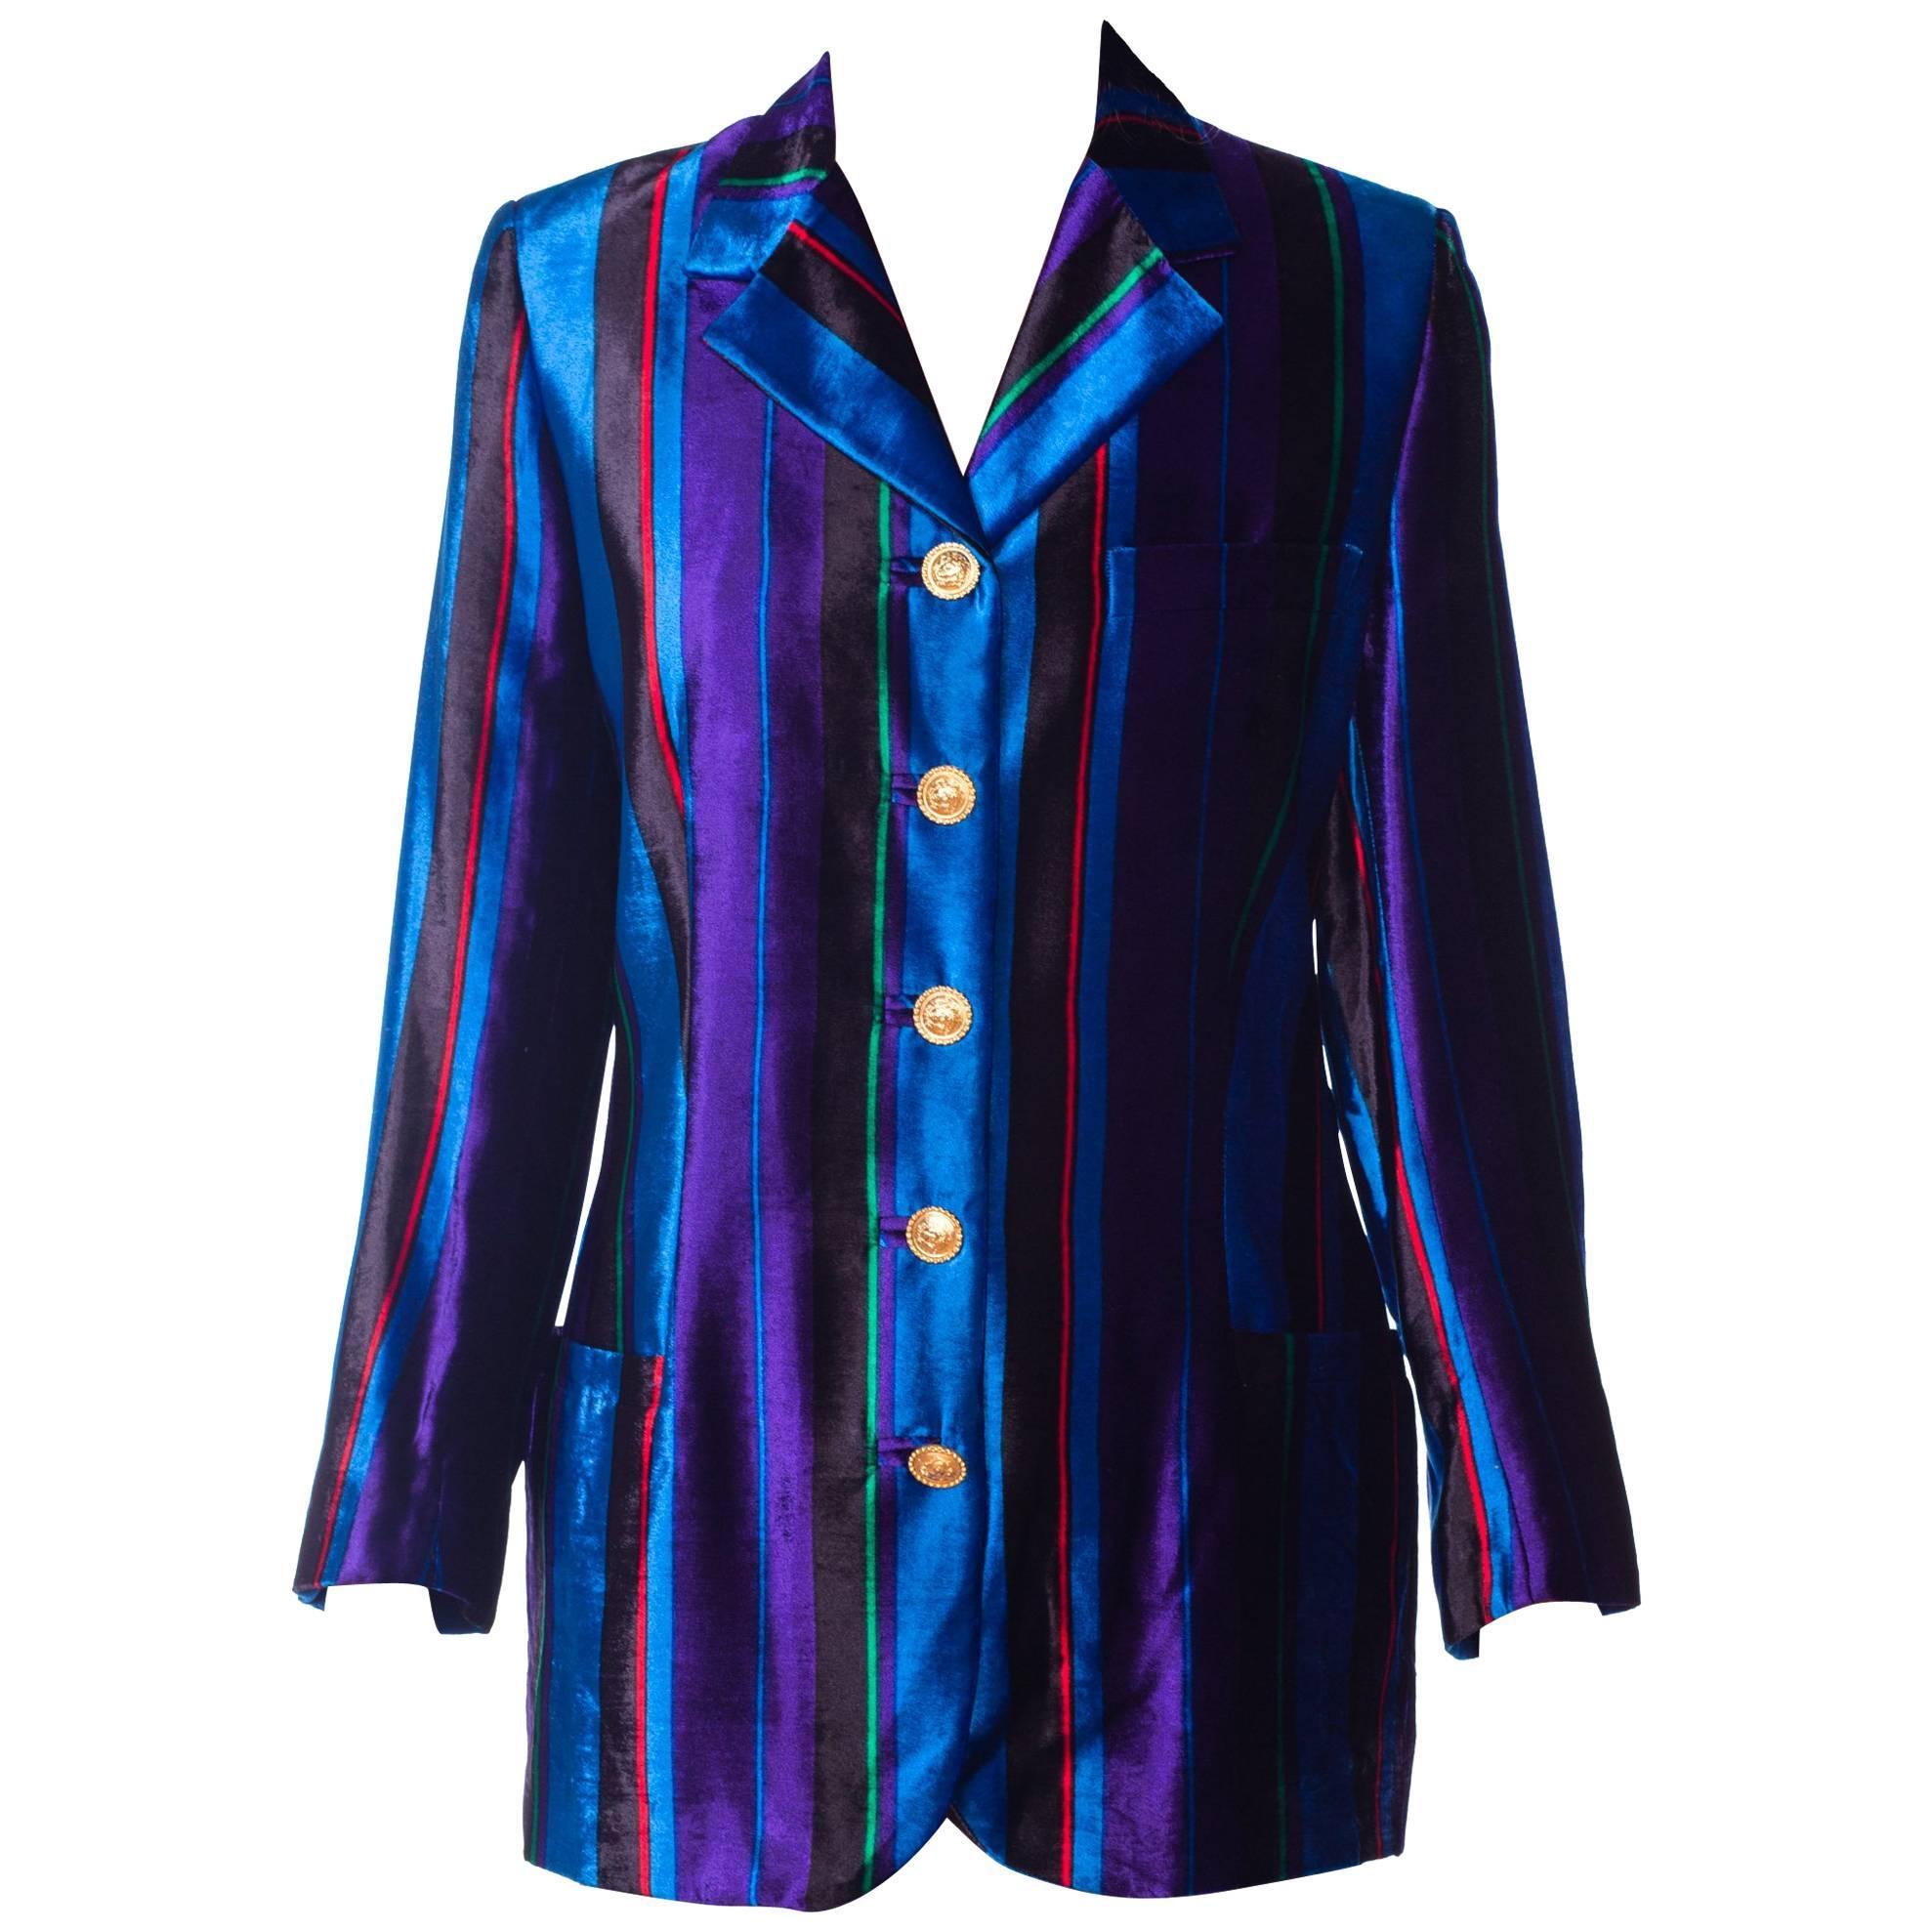 Gianni Versace Couture Striped Velvet Blazer, Fall 1993